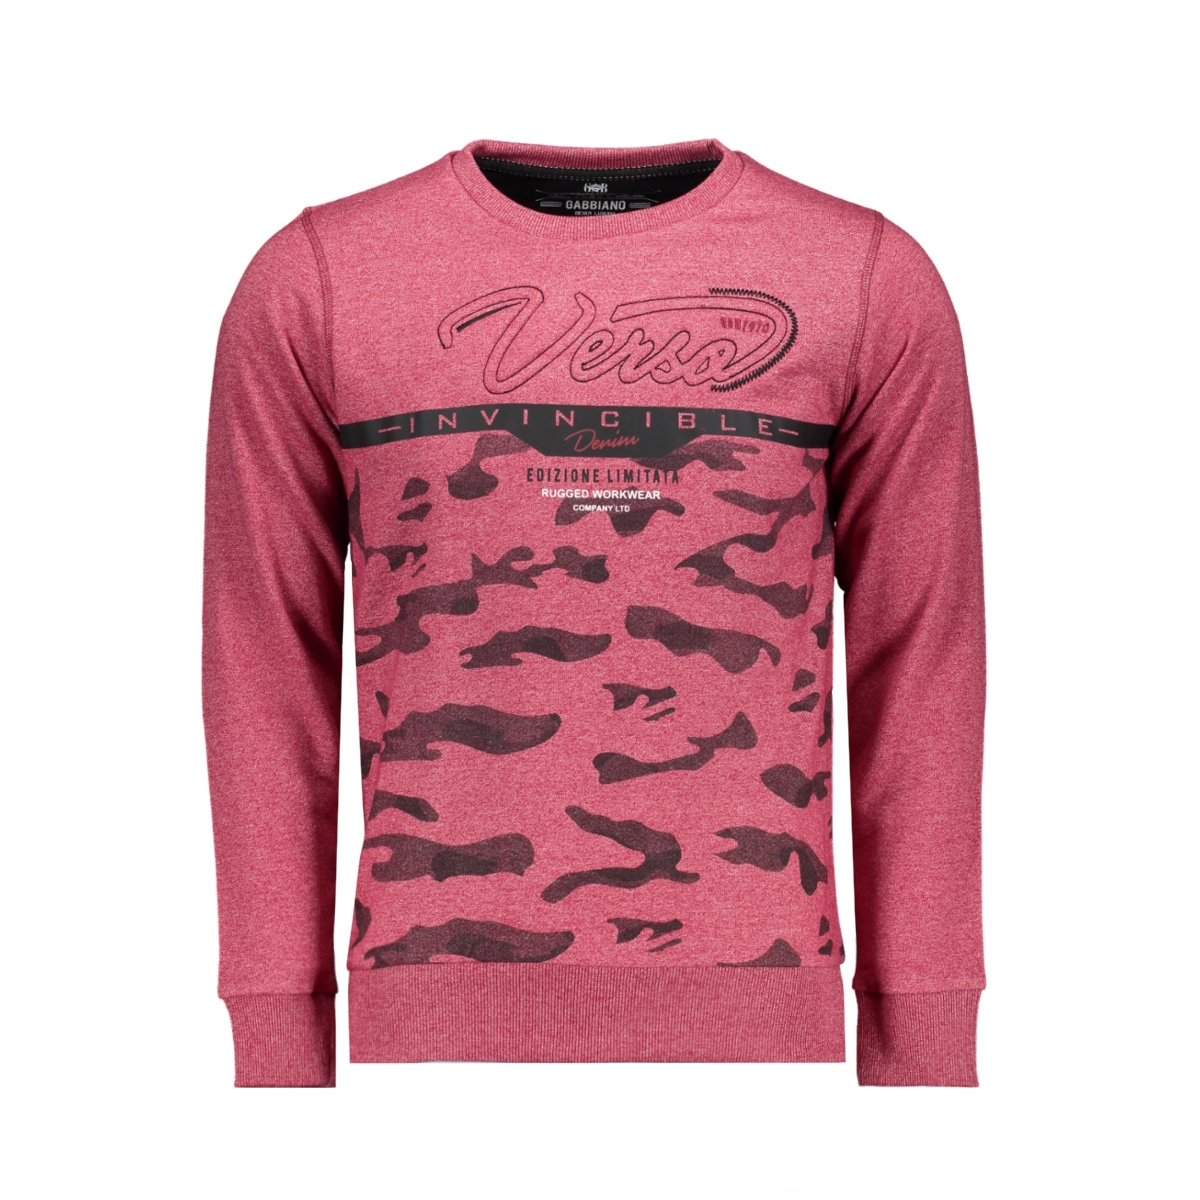 76134 gabbiano sweater bordeaux